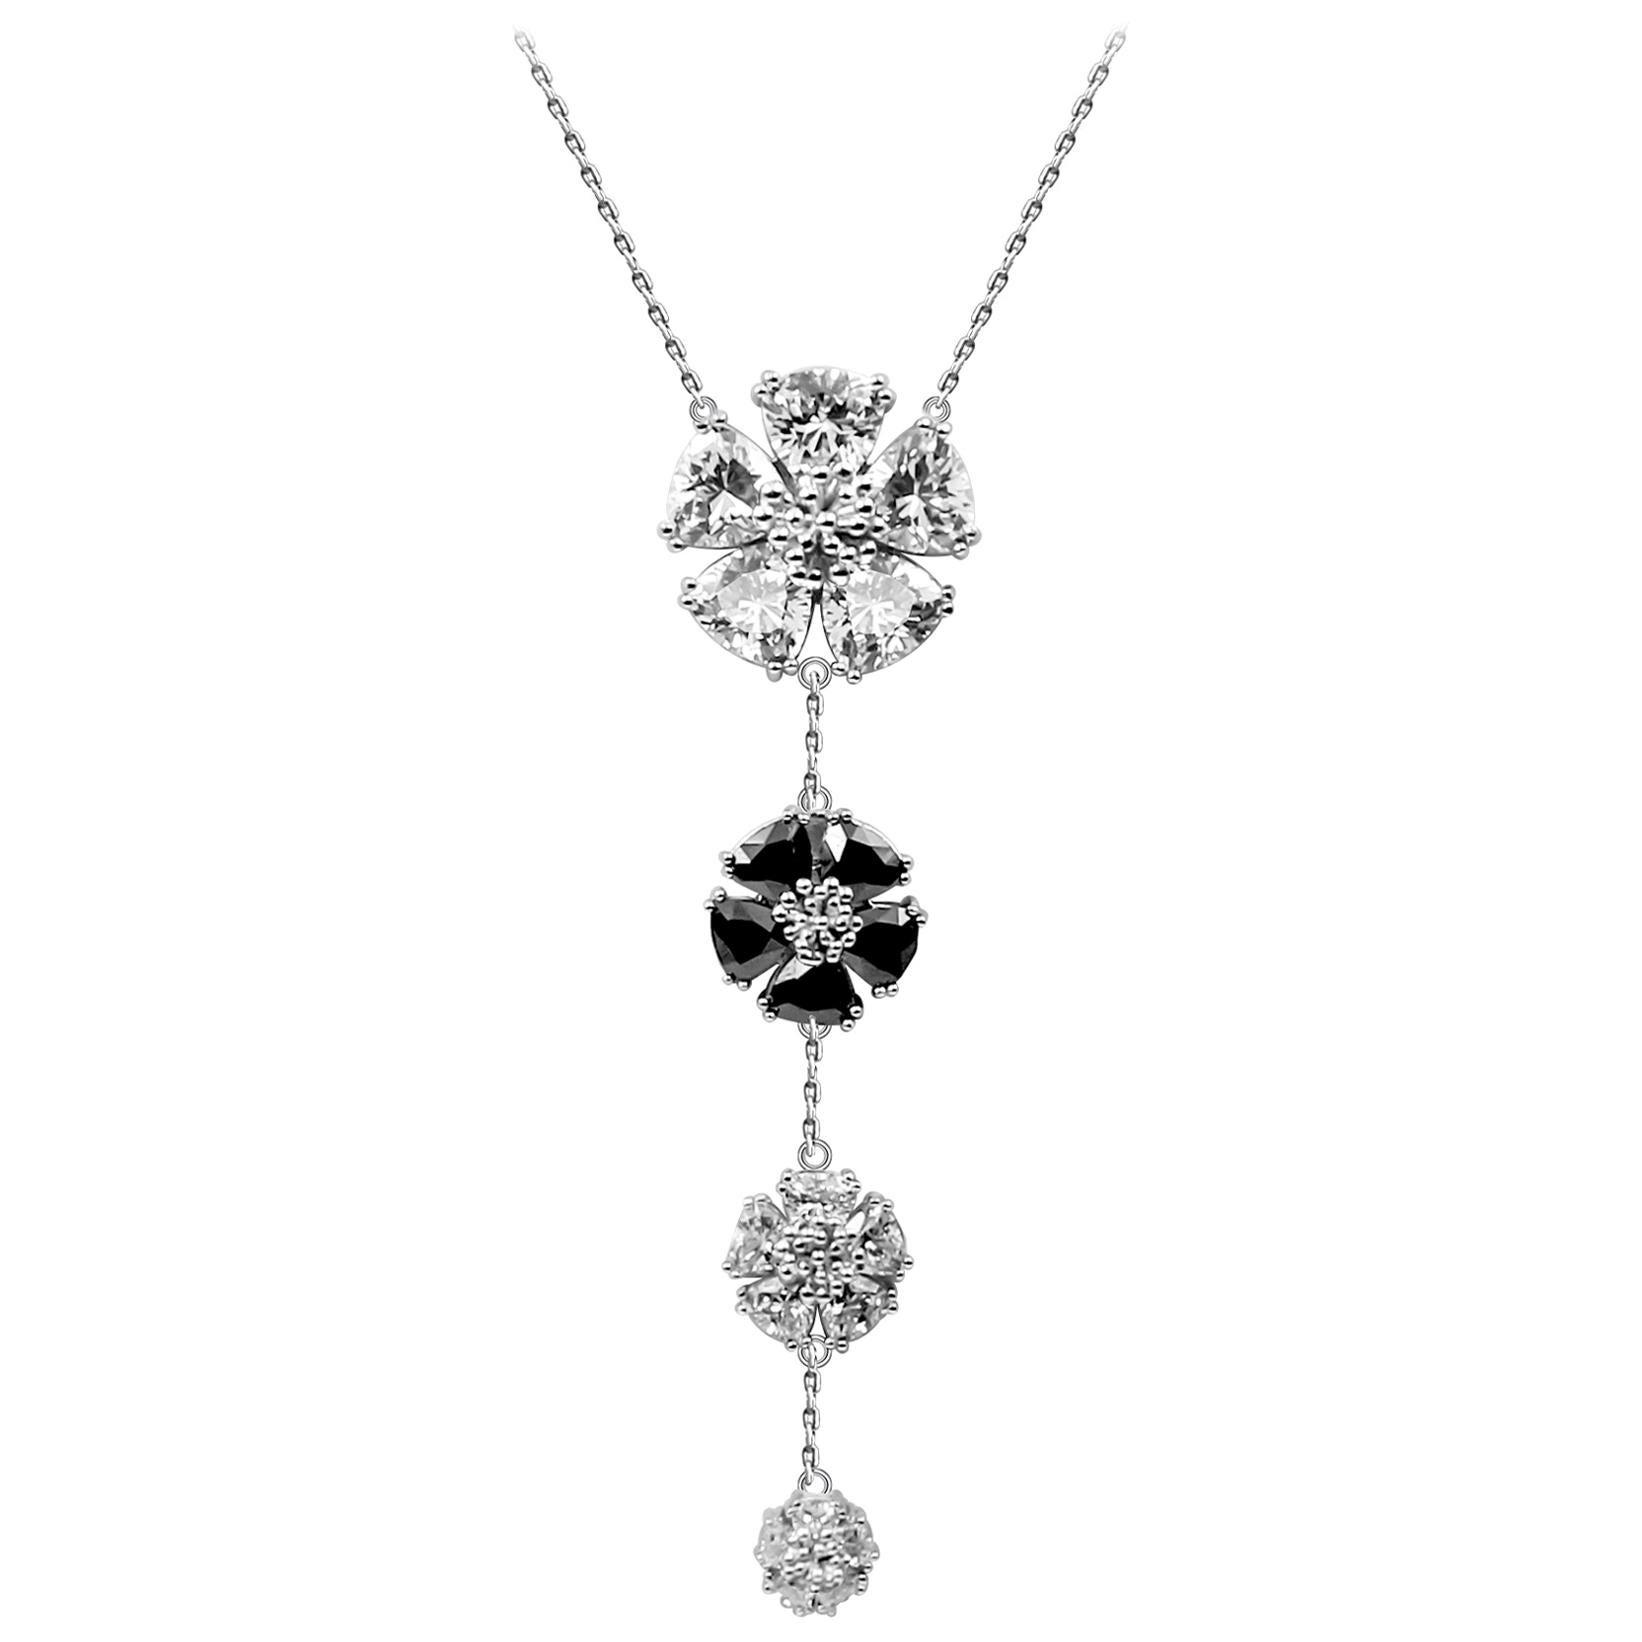 White Topaz, Gray & Black Spinel Graduated Blossom Stone Lariat Necklace